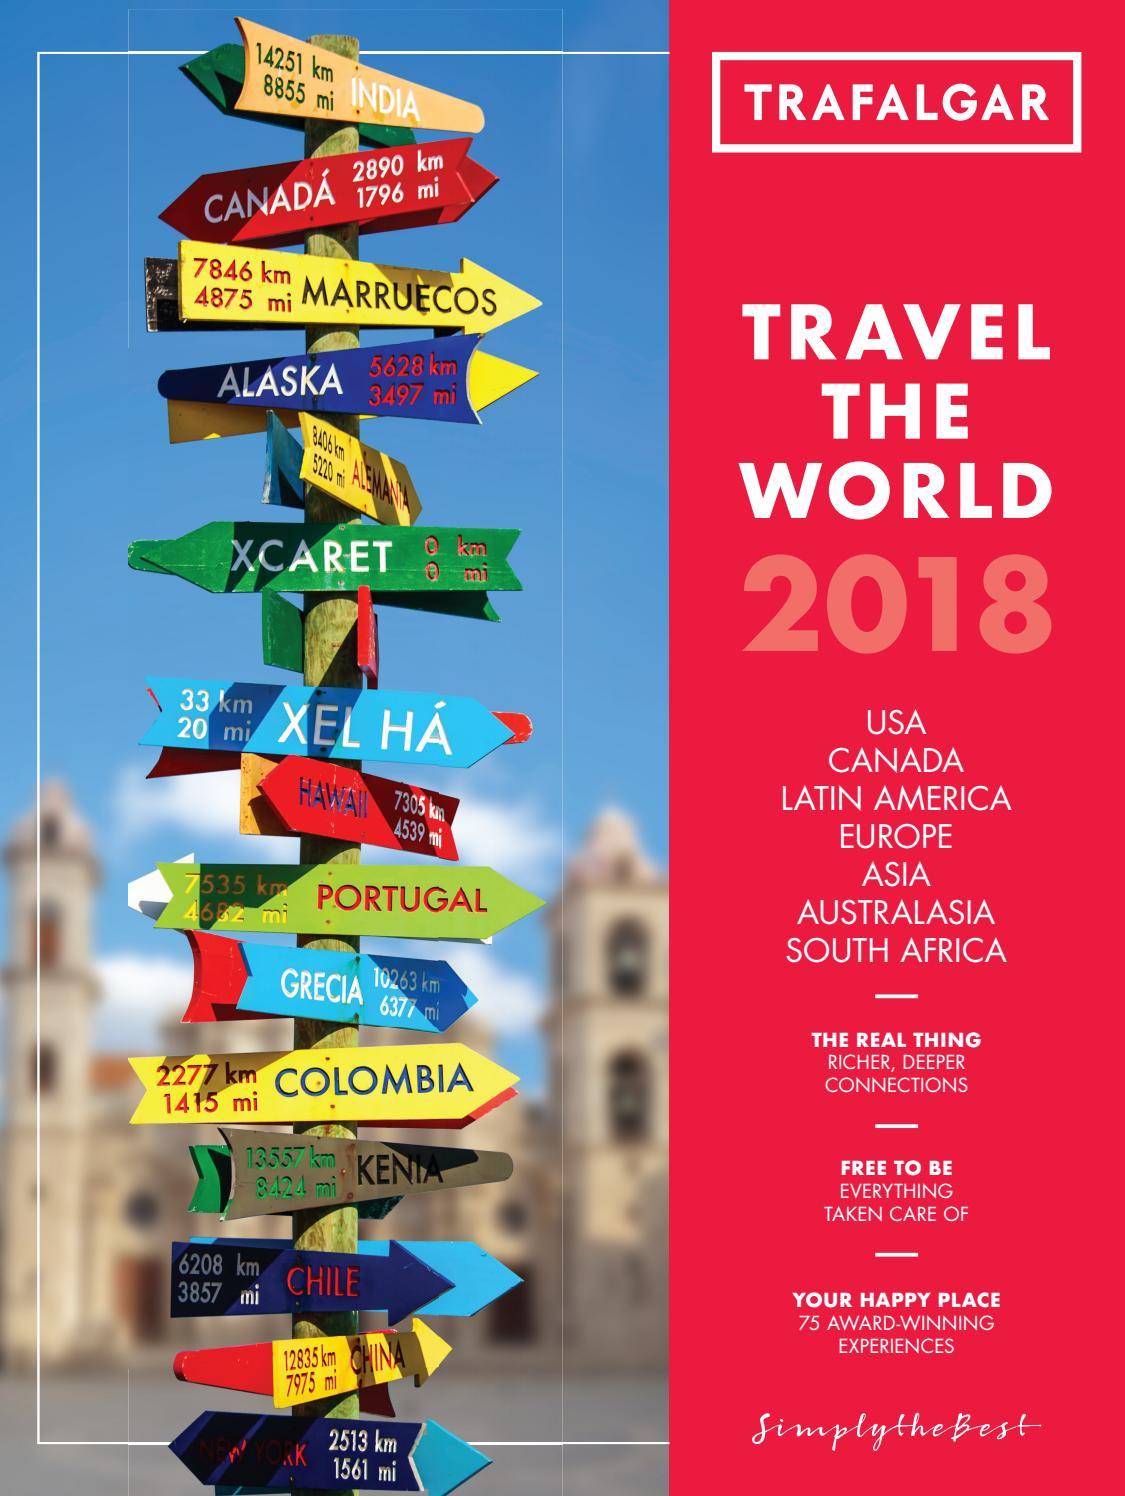 378d72917d2 Worldwide UK 2018 by Trafalgar - issuu